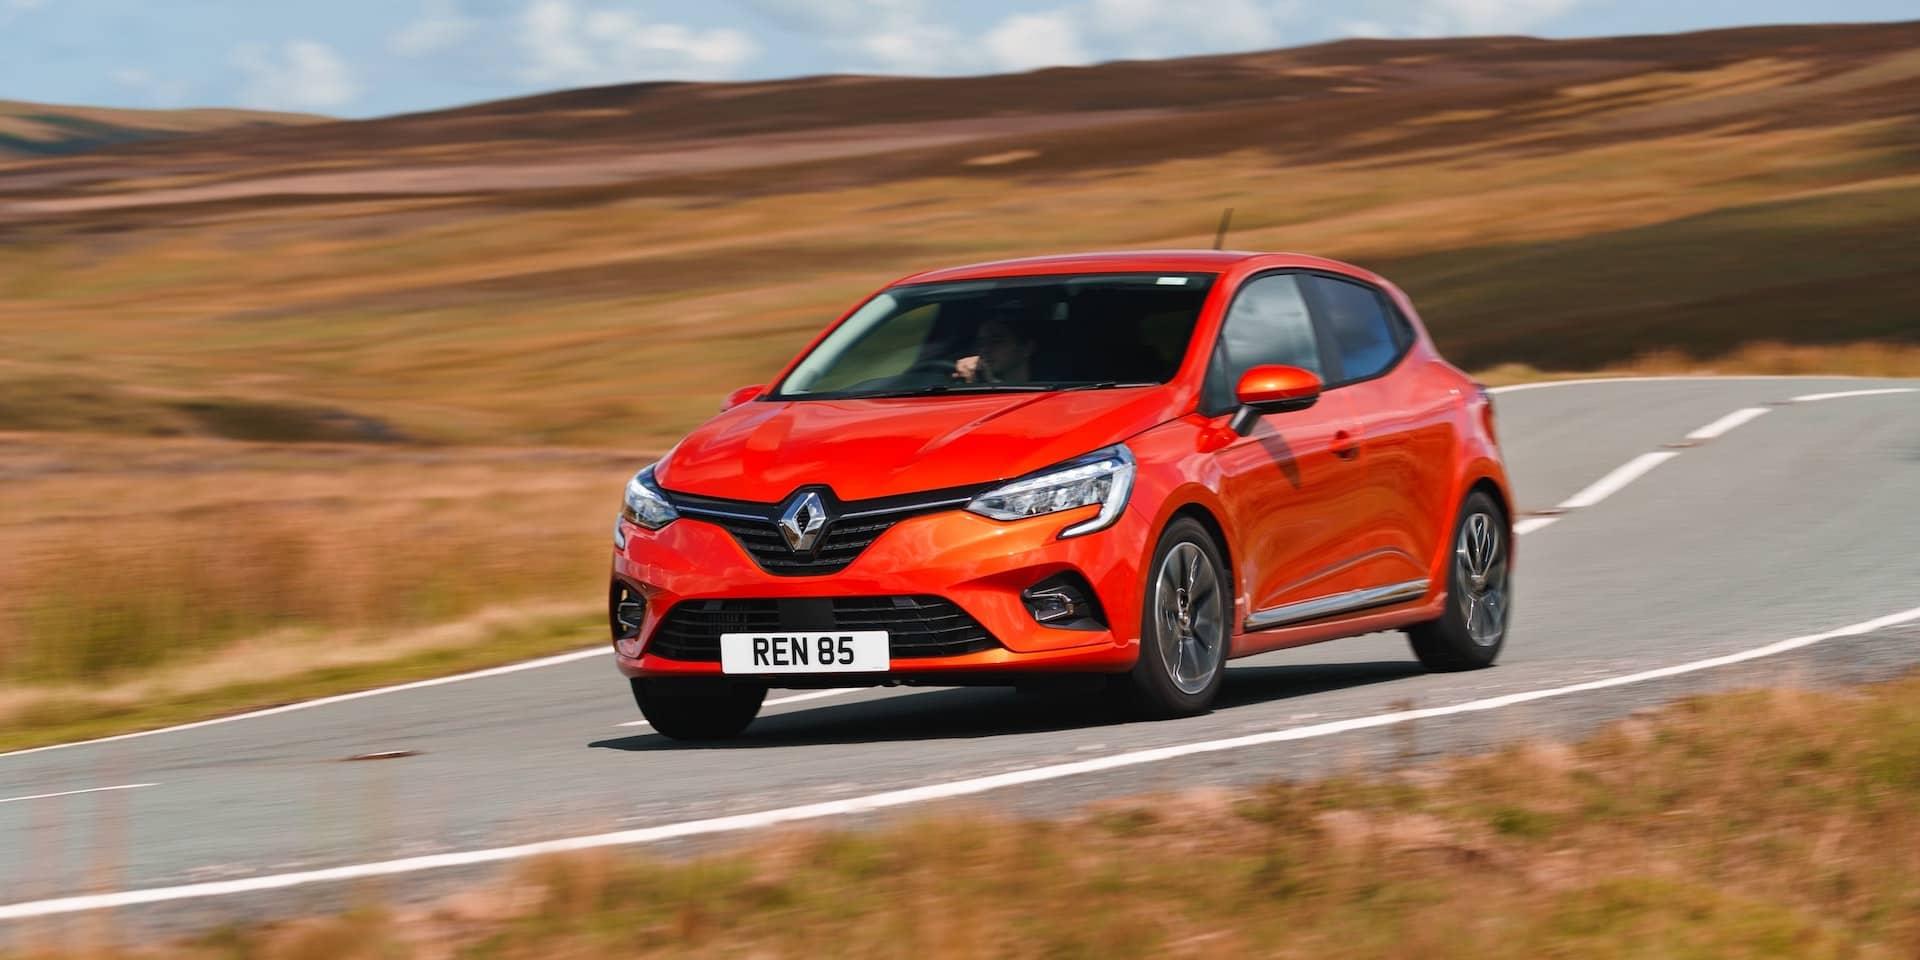 2020 Renault Clio review wallpaper